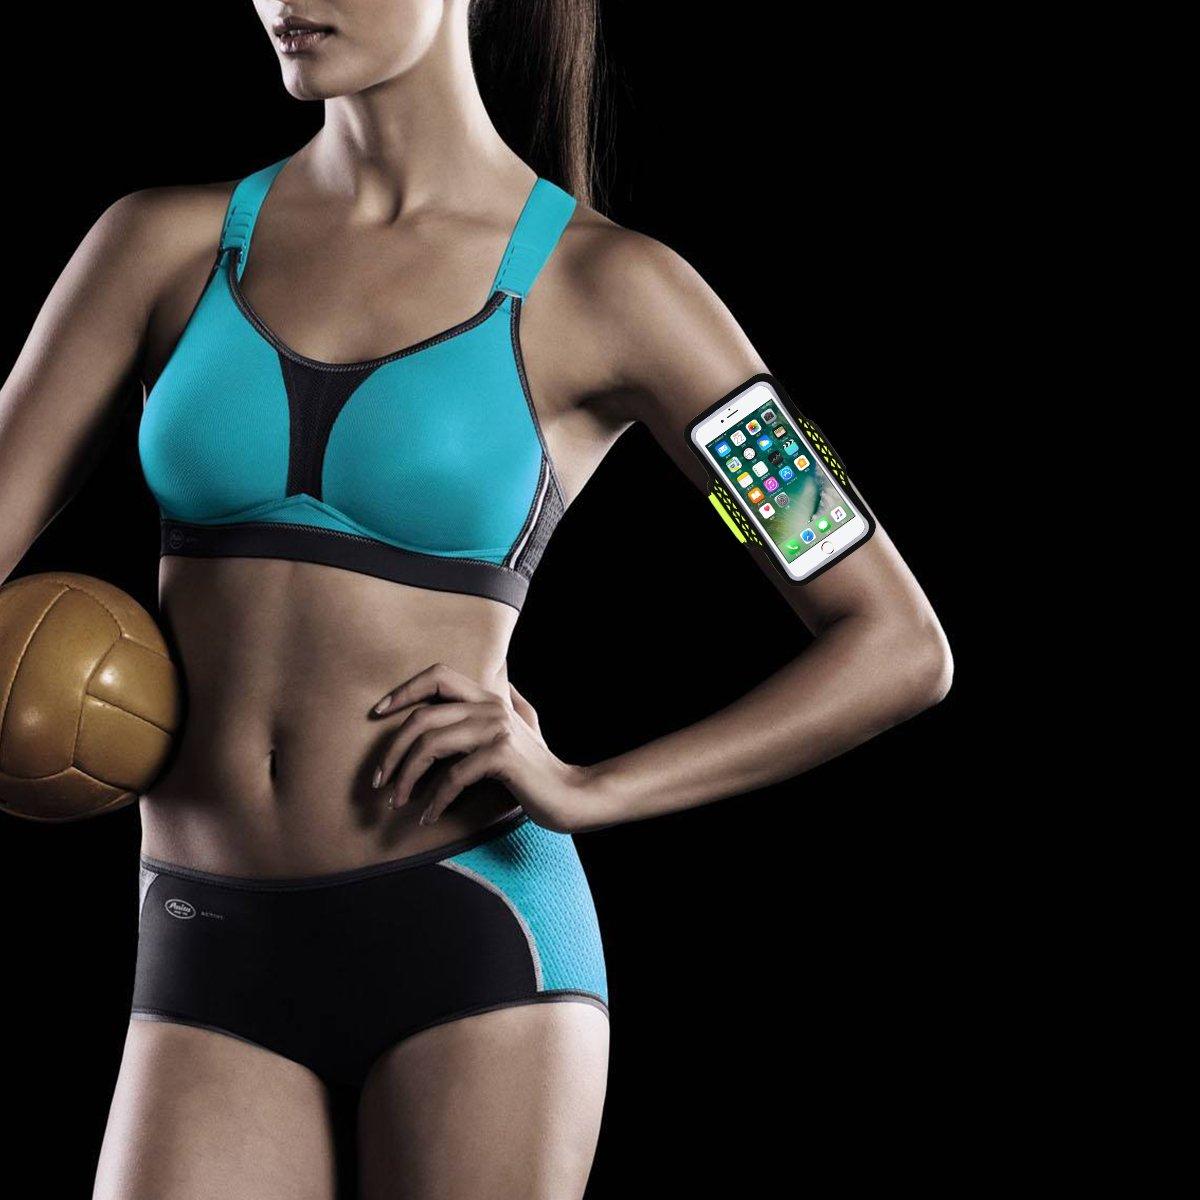 Haissky deporte running Armband a prueba de sudor brazalete para iPhone 7 Plus 6 Plus 6S Plus Samsung Galaxy S5 S6 S7 edge Plus Nota 5 con ID tarjeta de Cr/édito Dinero Soporte,para 5.5-5.8 tel/éfono